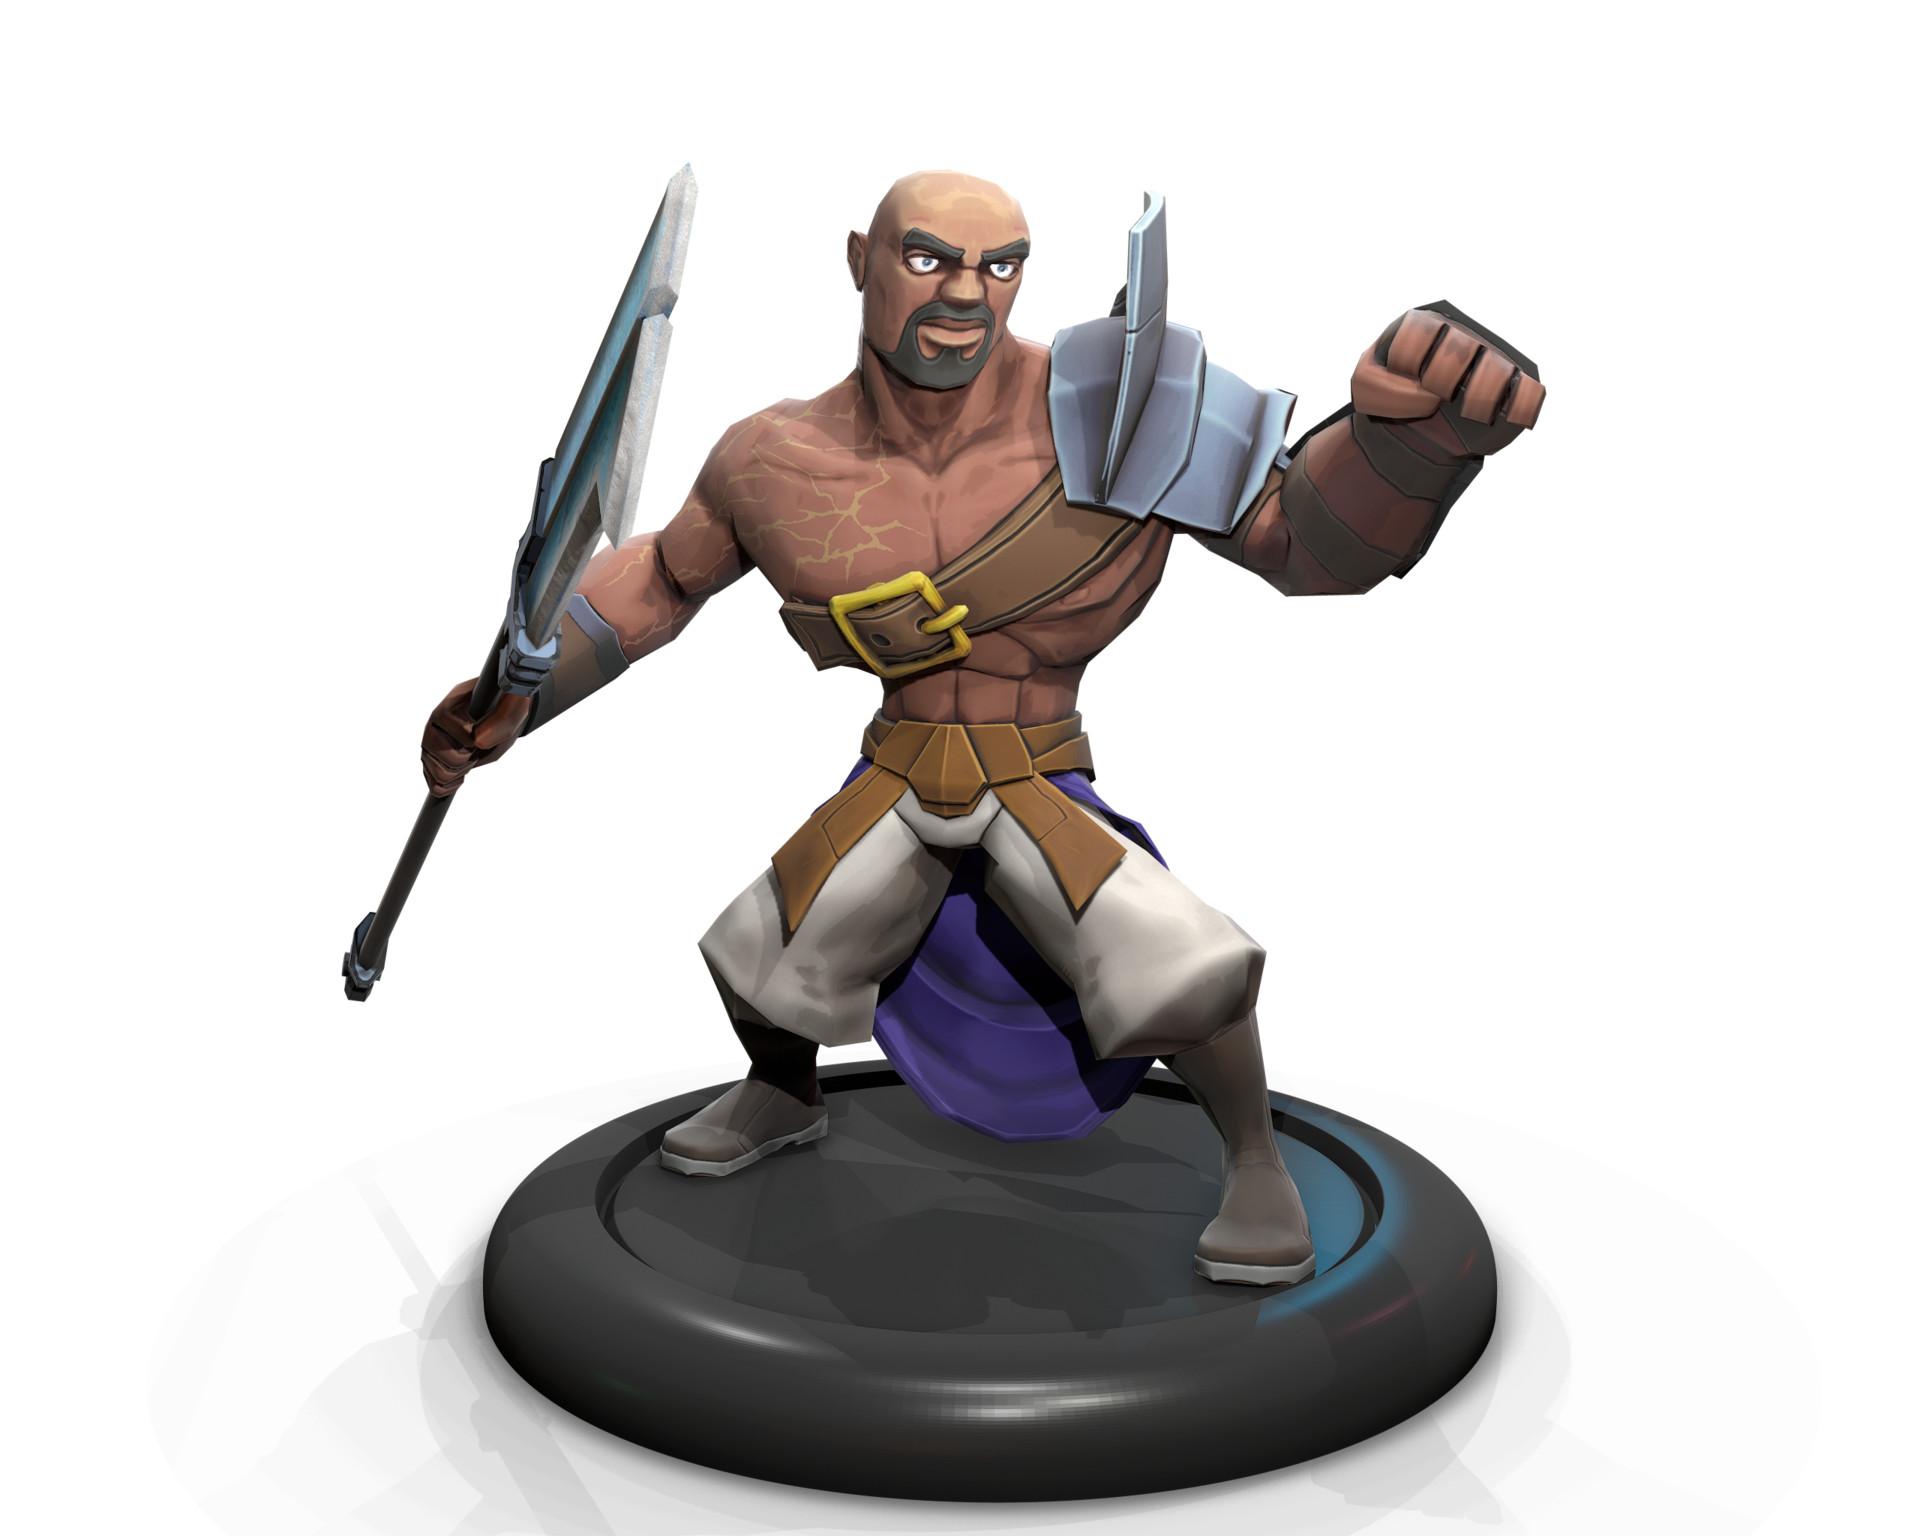 Nick bozarth kunorender 2